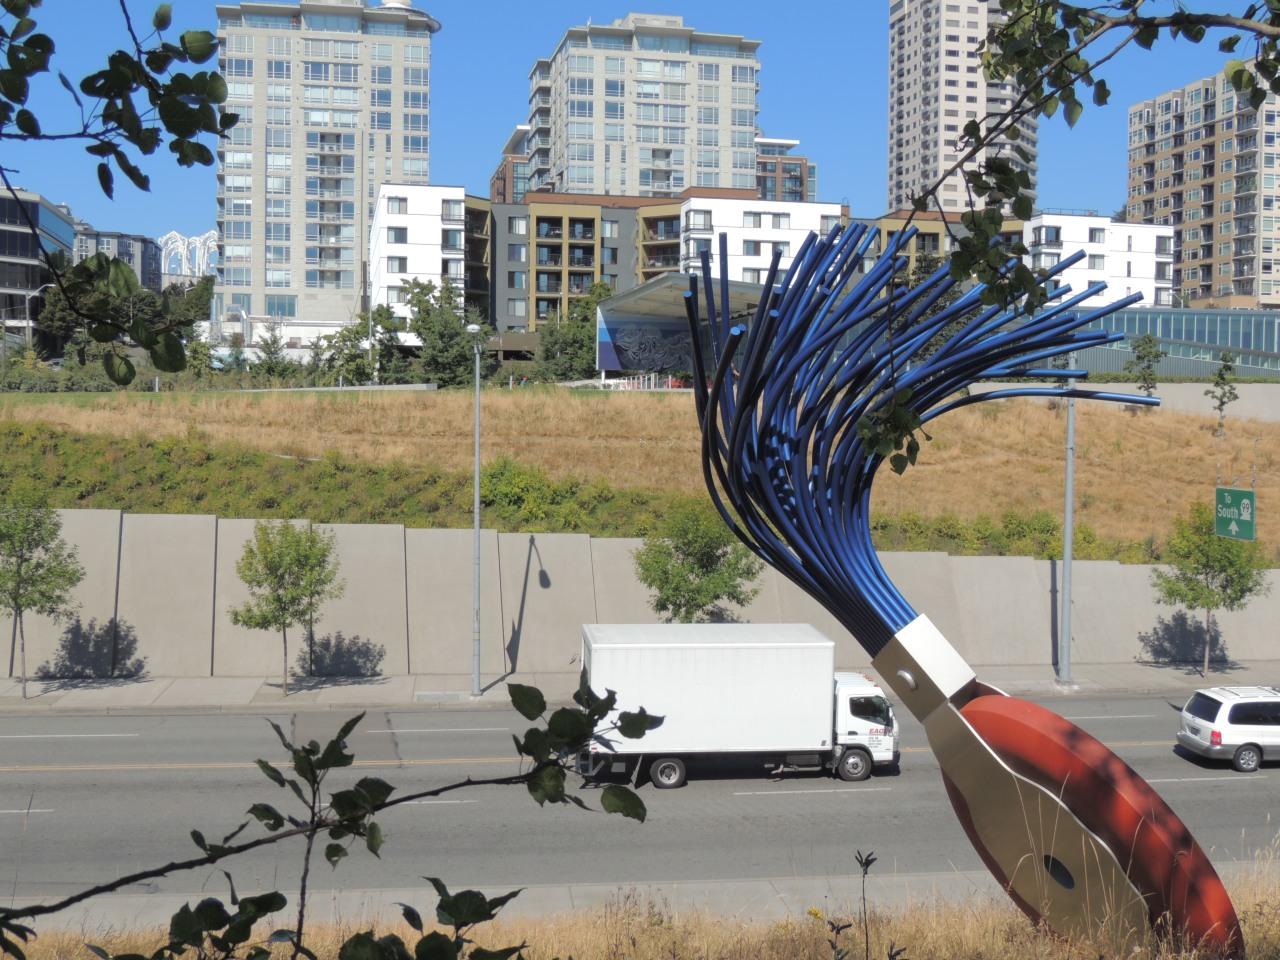 #Seattle #Eraser #Olympic #Sculpture Park